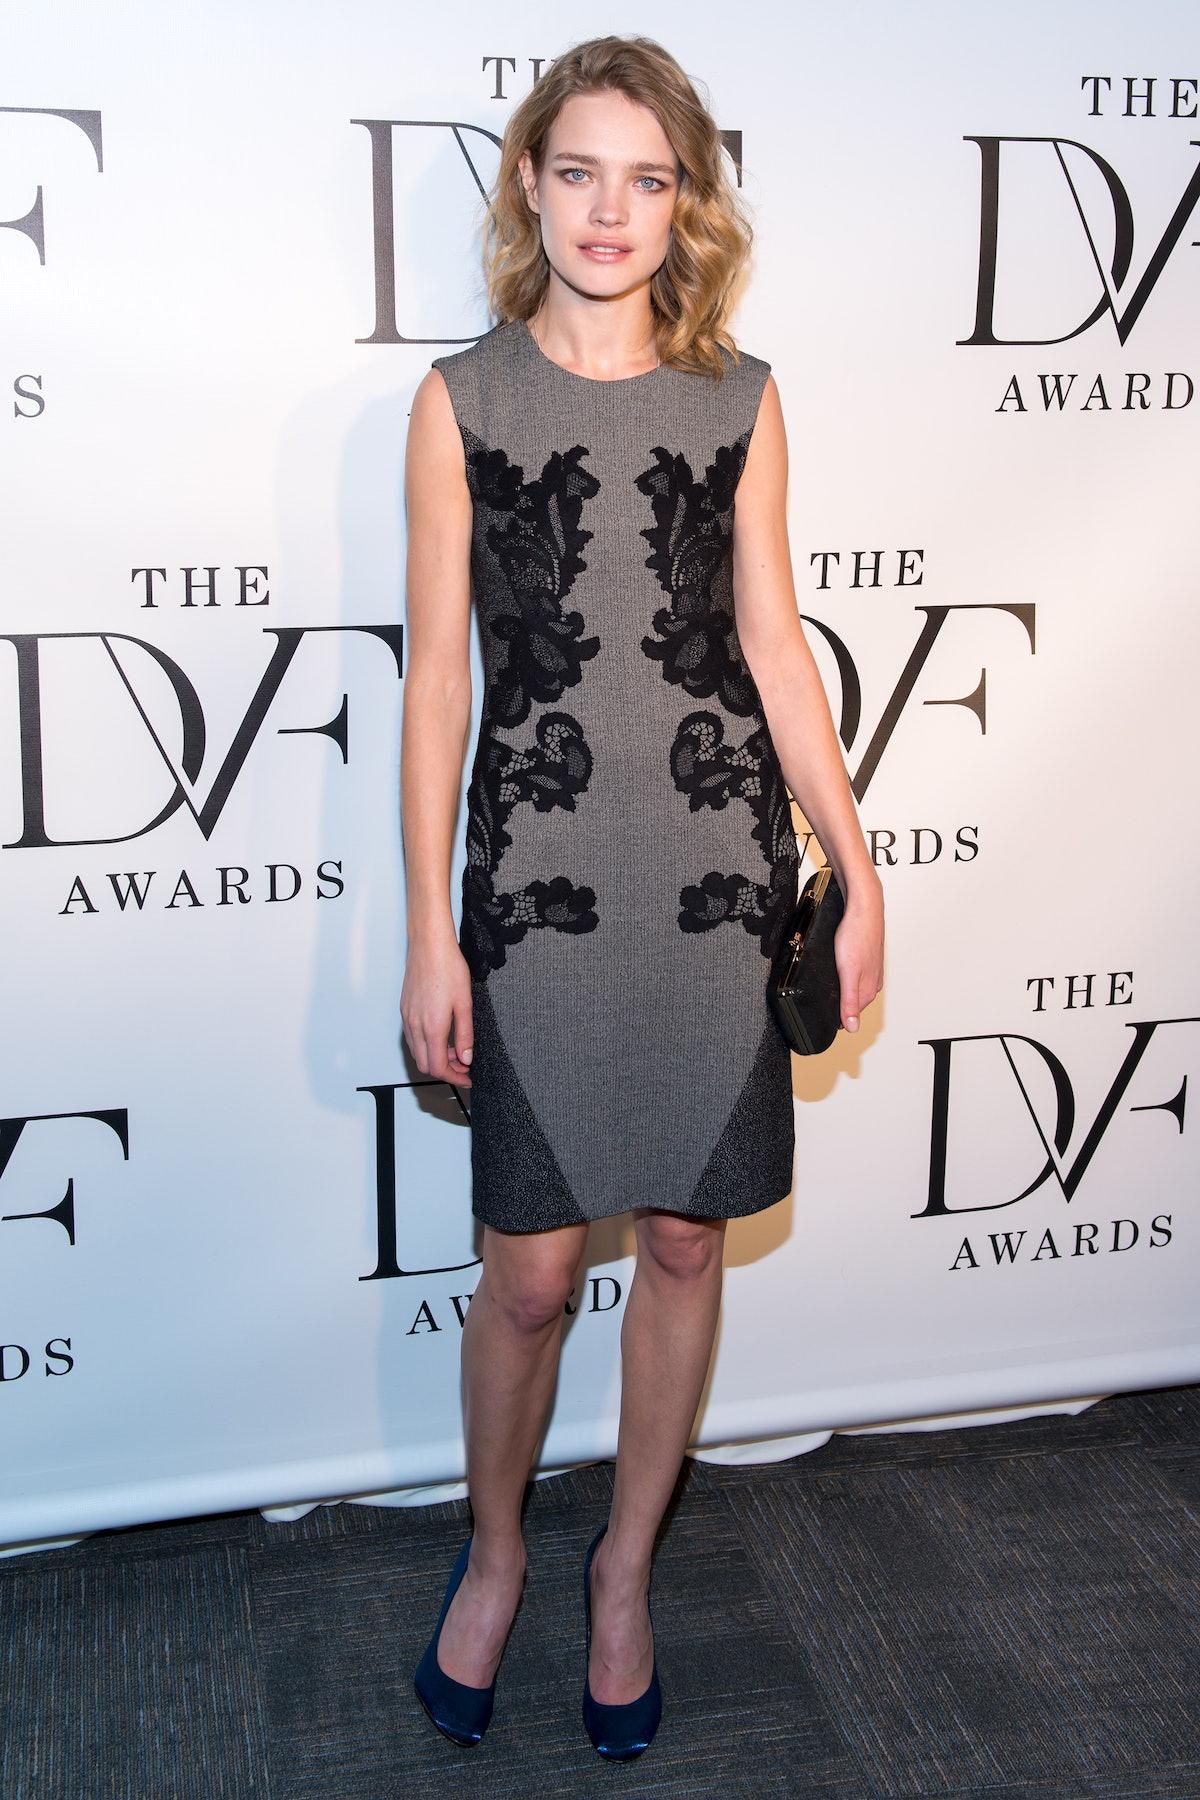 2013 DVF Awards